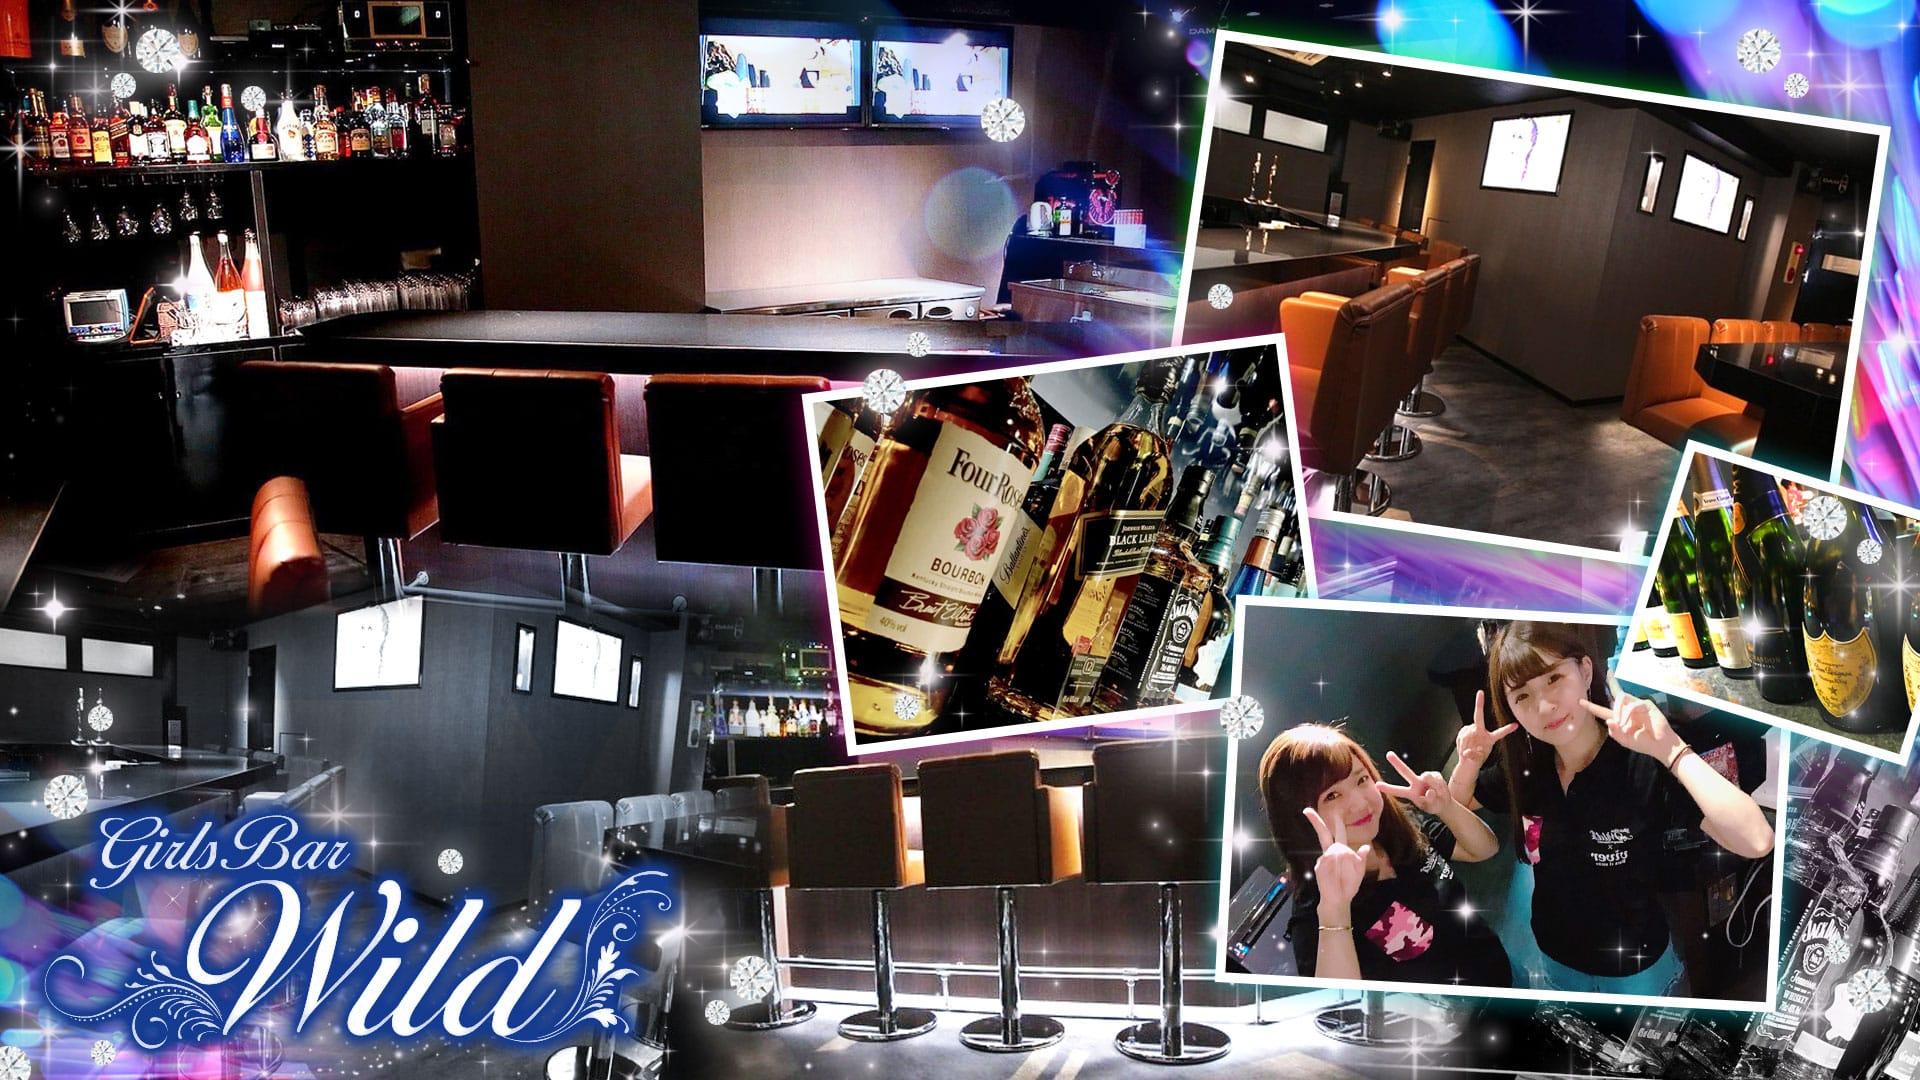 Girl's Bar WILD<ワイルド> 錦糸町 ガールズバー TOP画像